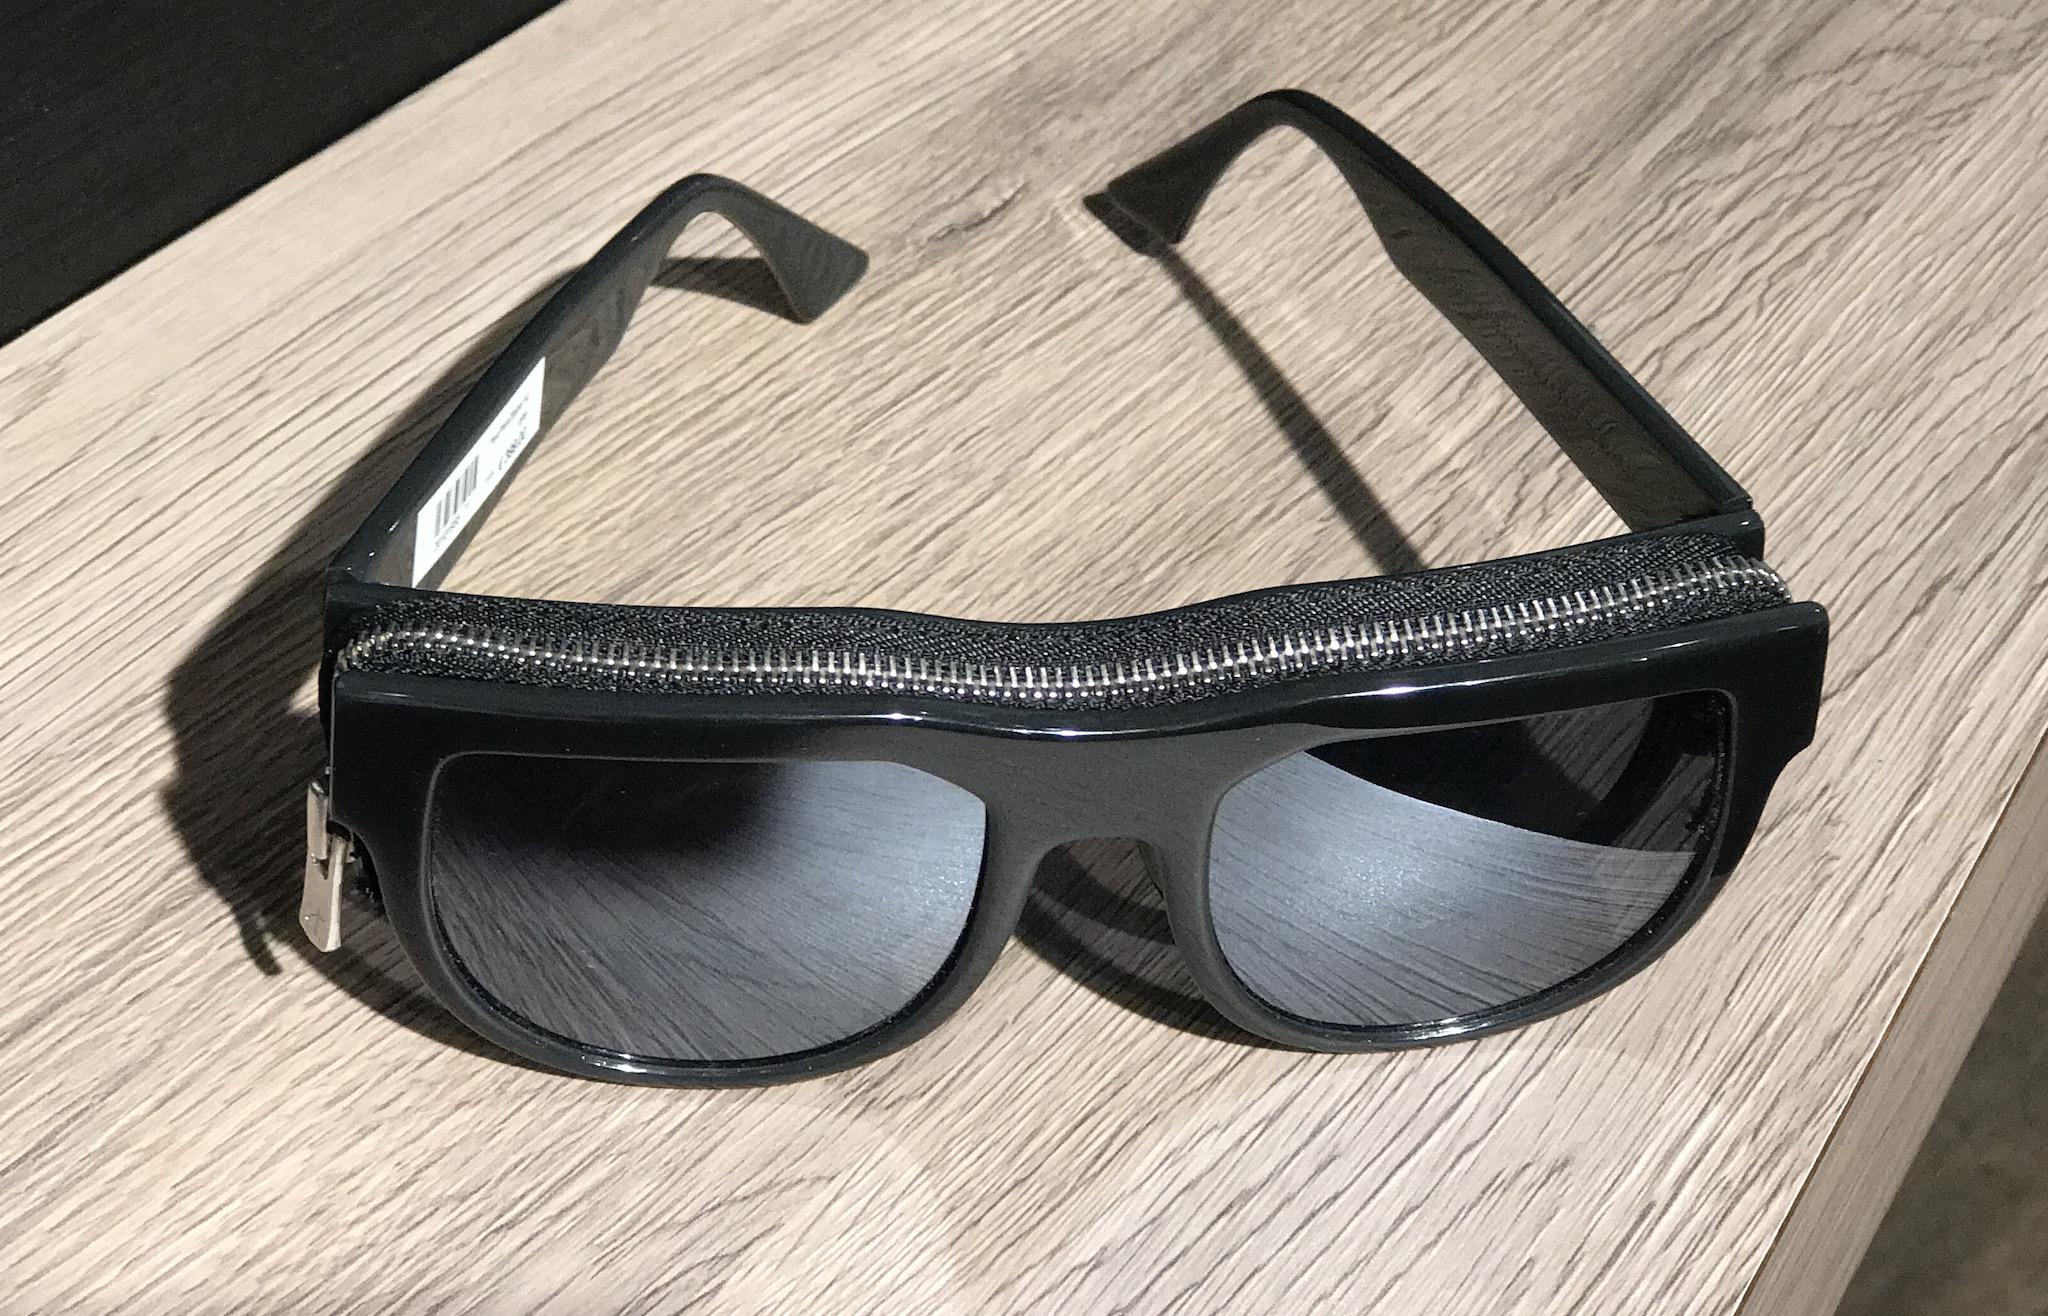 Optik Scharnagl Sölden, Optiker Sölden, Tom Ford sunglasses zipper, Tom Ford Sonnenbrille Reißverschluss, Fashion-Blog, Lieblingsstil.comJPG